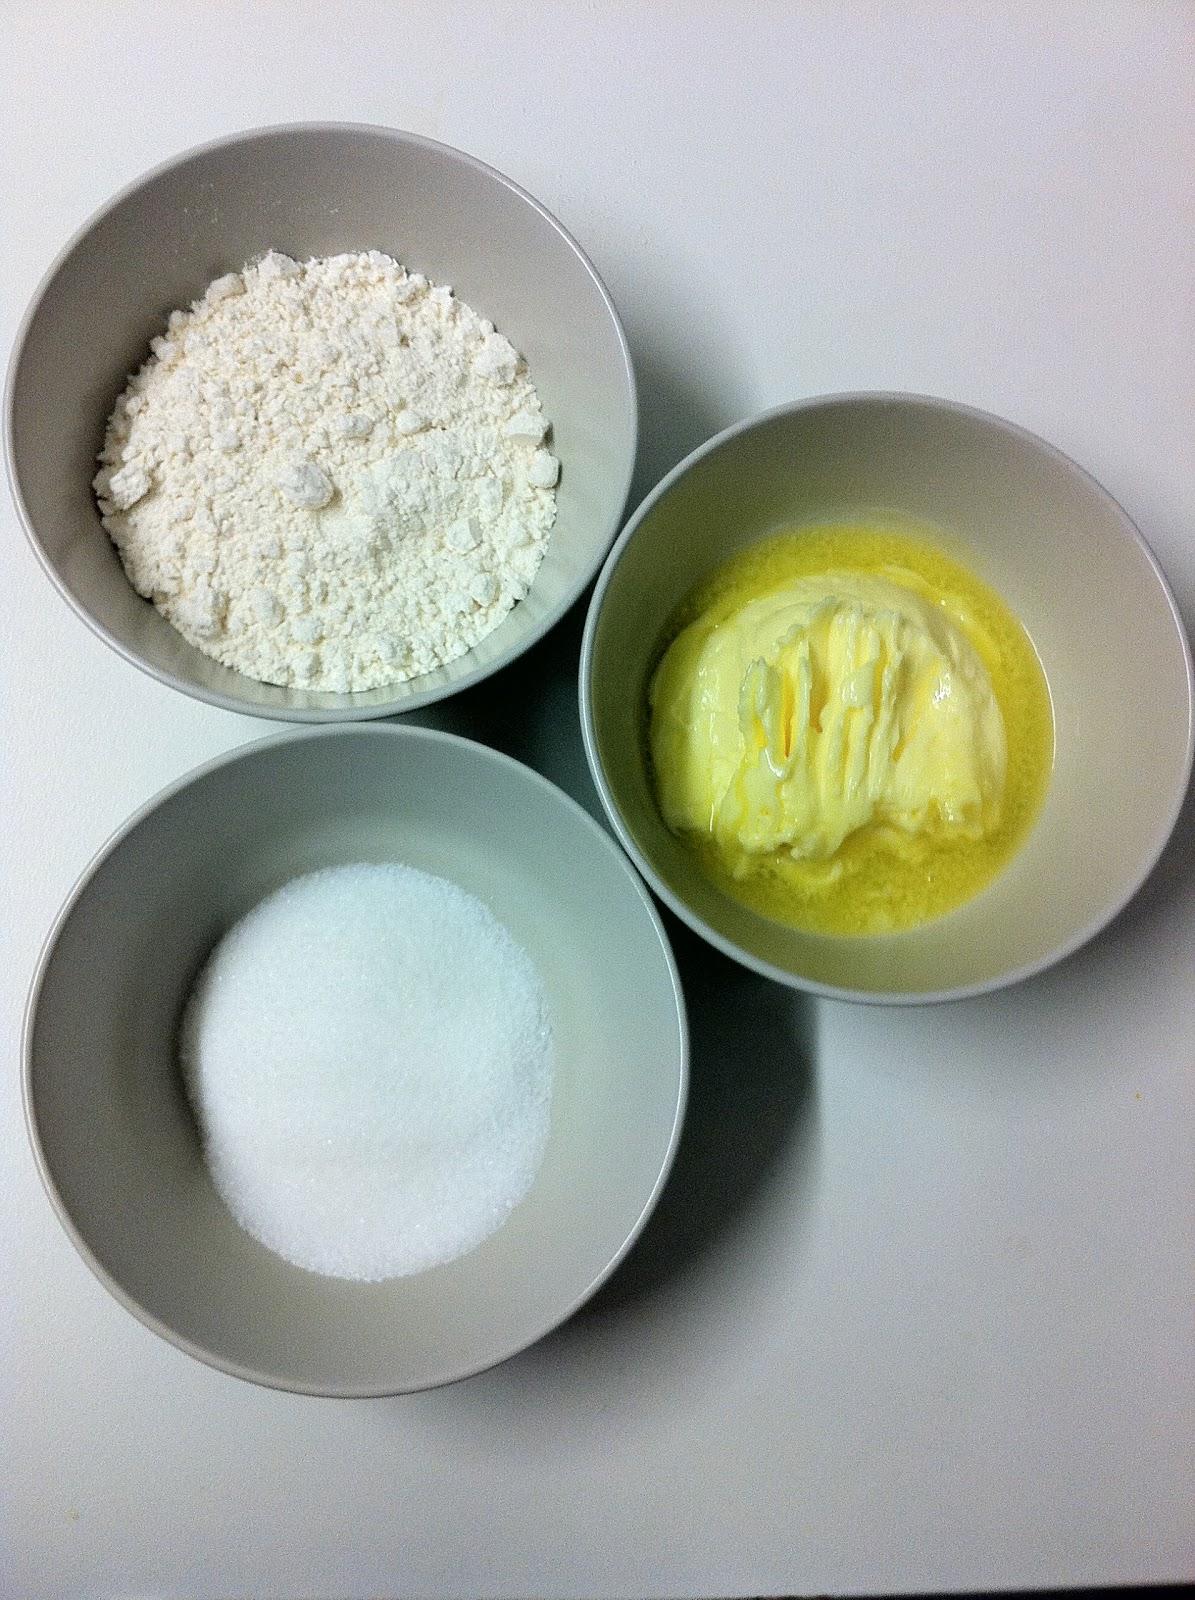 50 gramos de azúcar. 100 gramos de mantequilla. 150 gramos de harina.